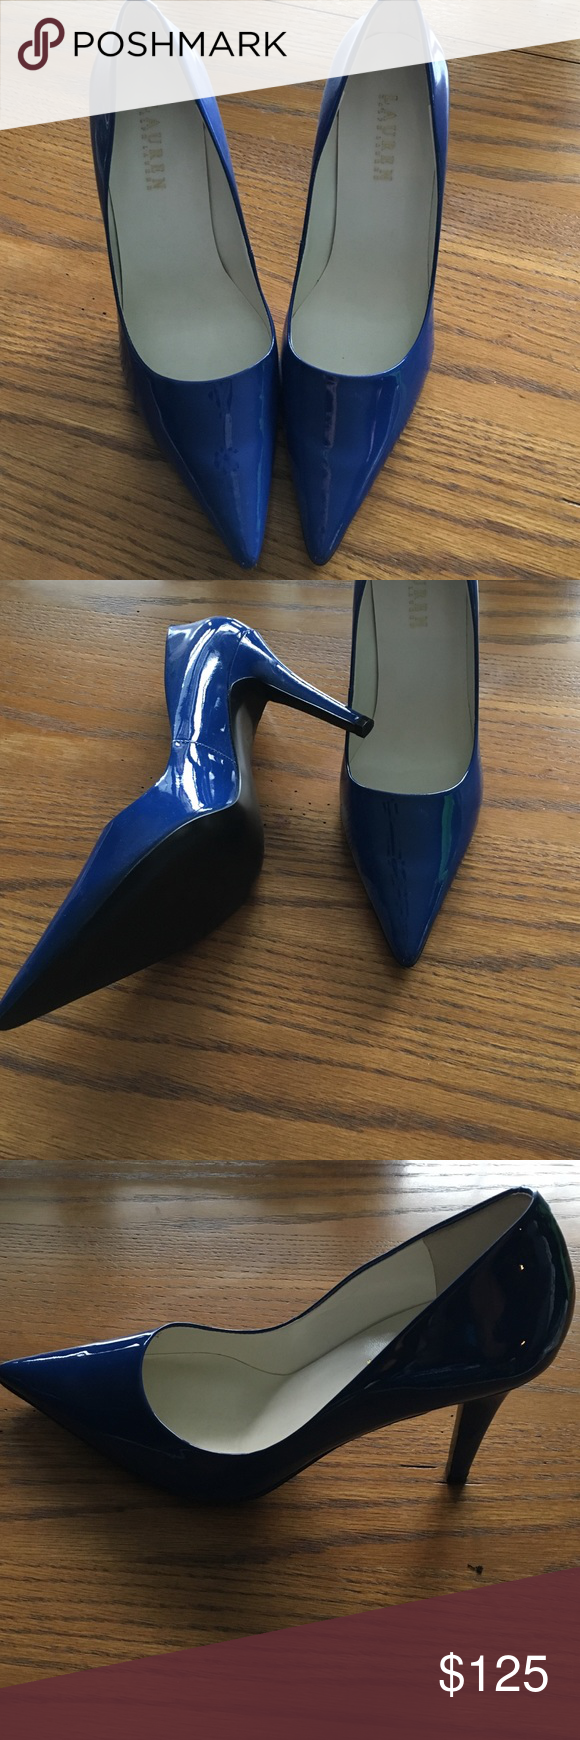 Gorgeous patent cobalt blue heels! New without box- Ralph Lauren cobalt blue heels. Size 10 Lauren Ralph Lauren Shoes Heels